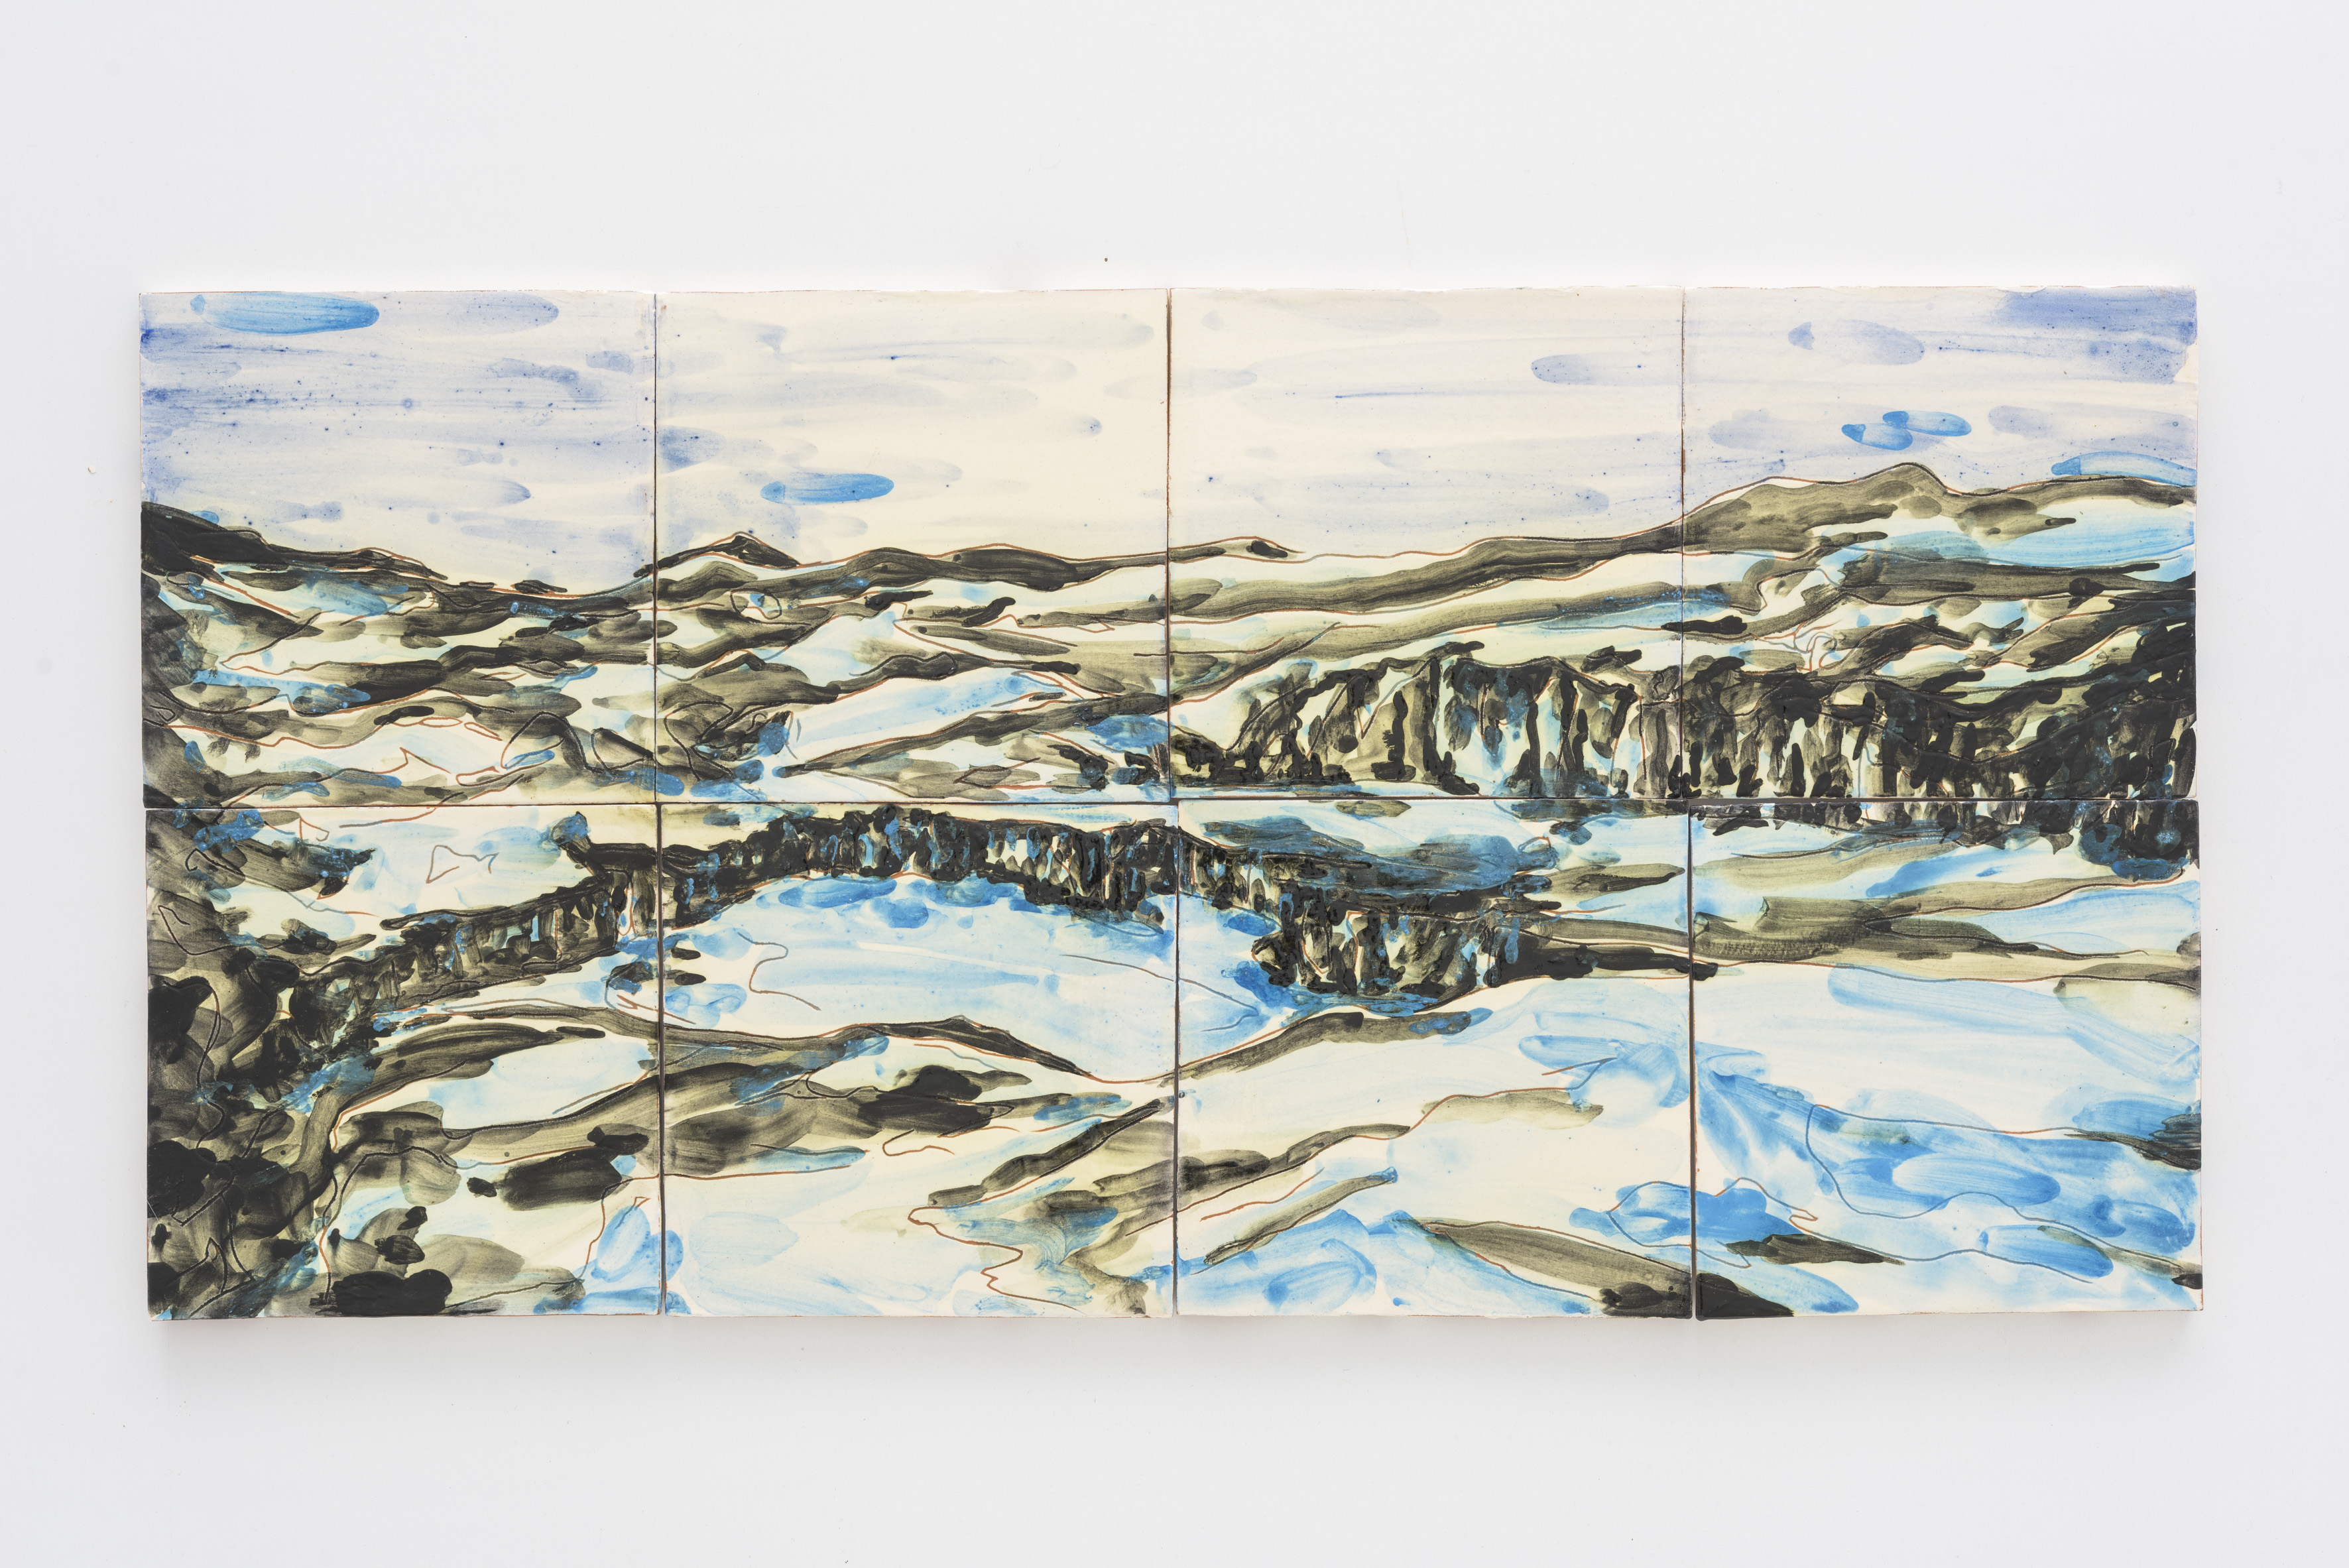 """Reclaimed VI"", 2 x 4 painted ceramic tiles, 30 x 60 cm., Portugal 2017"